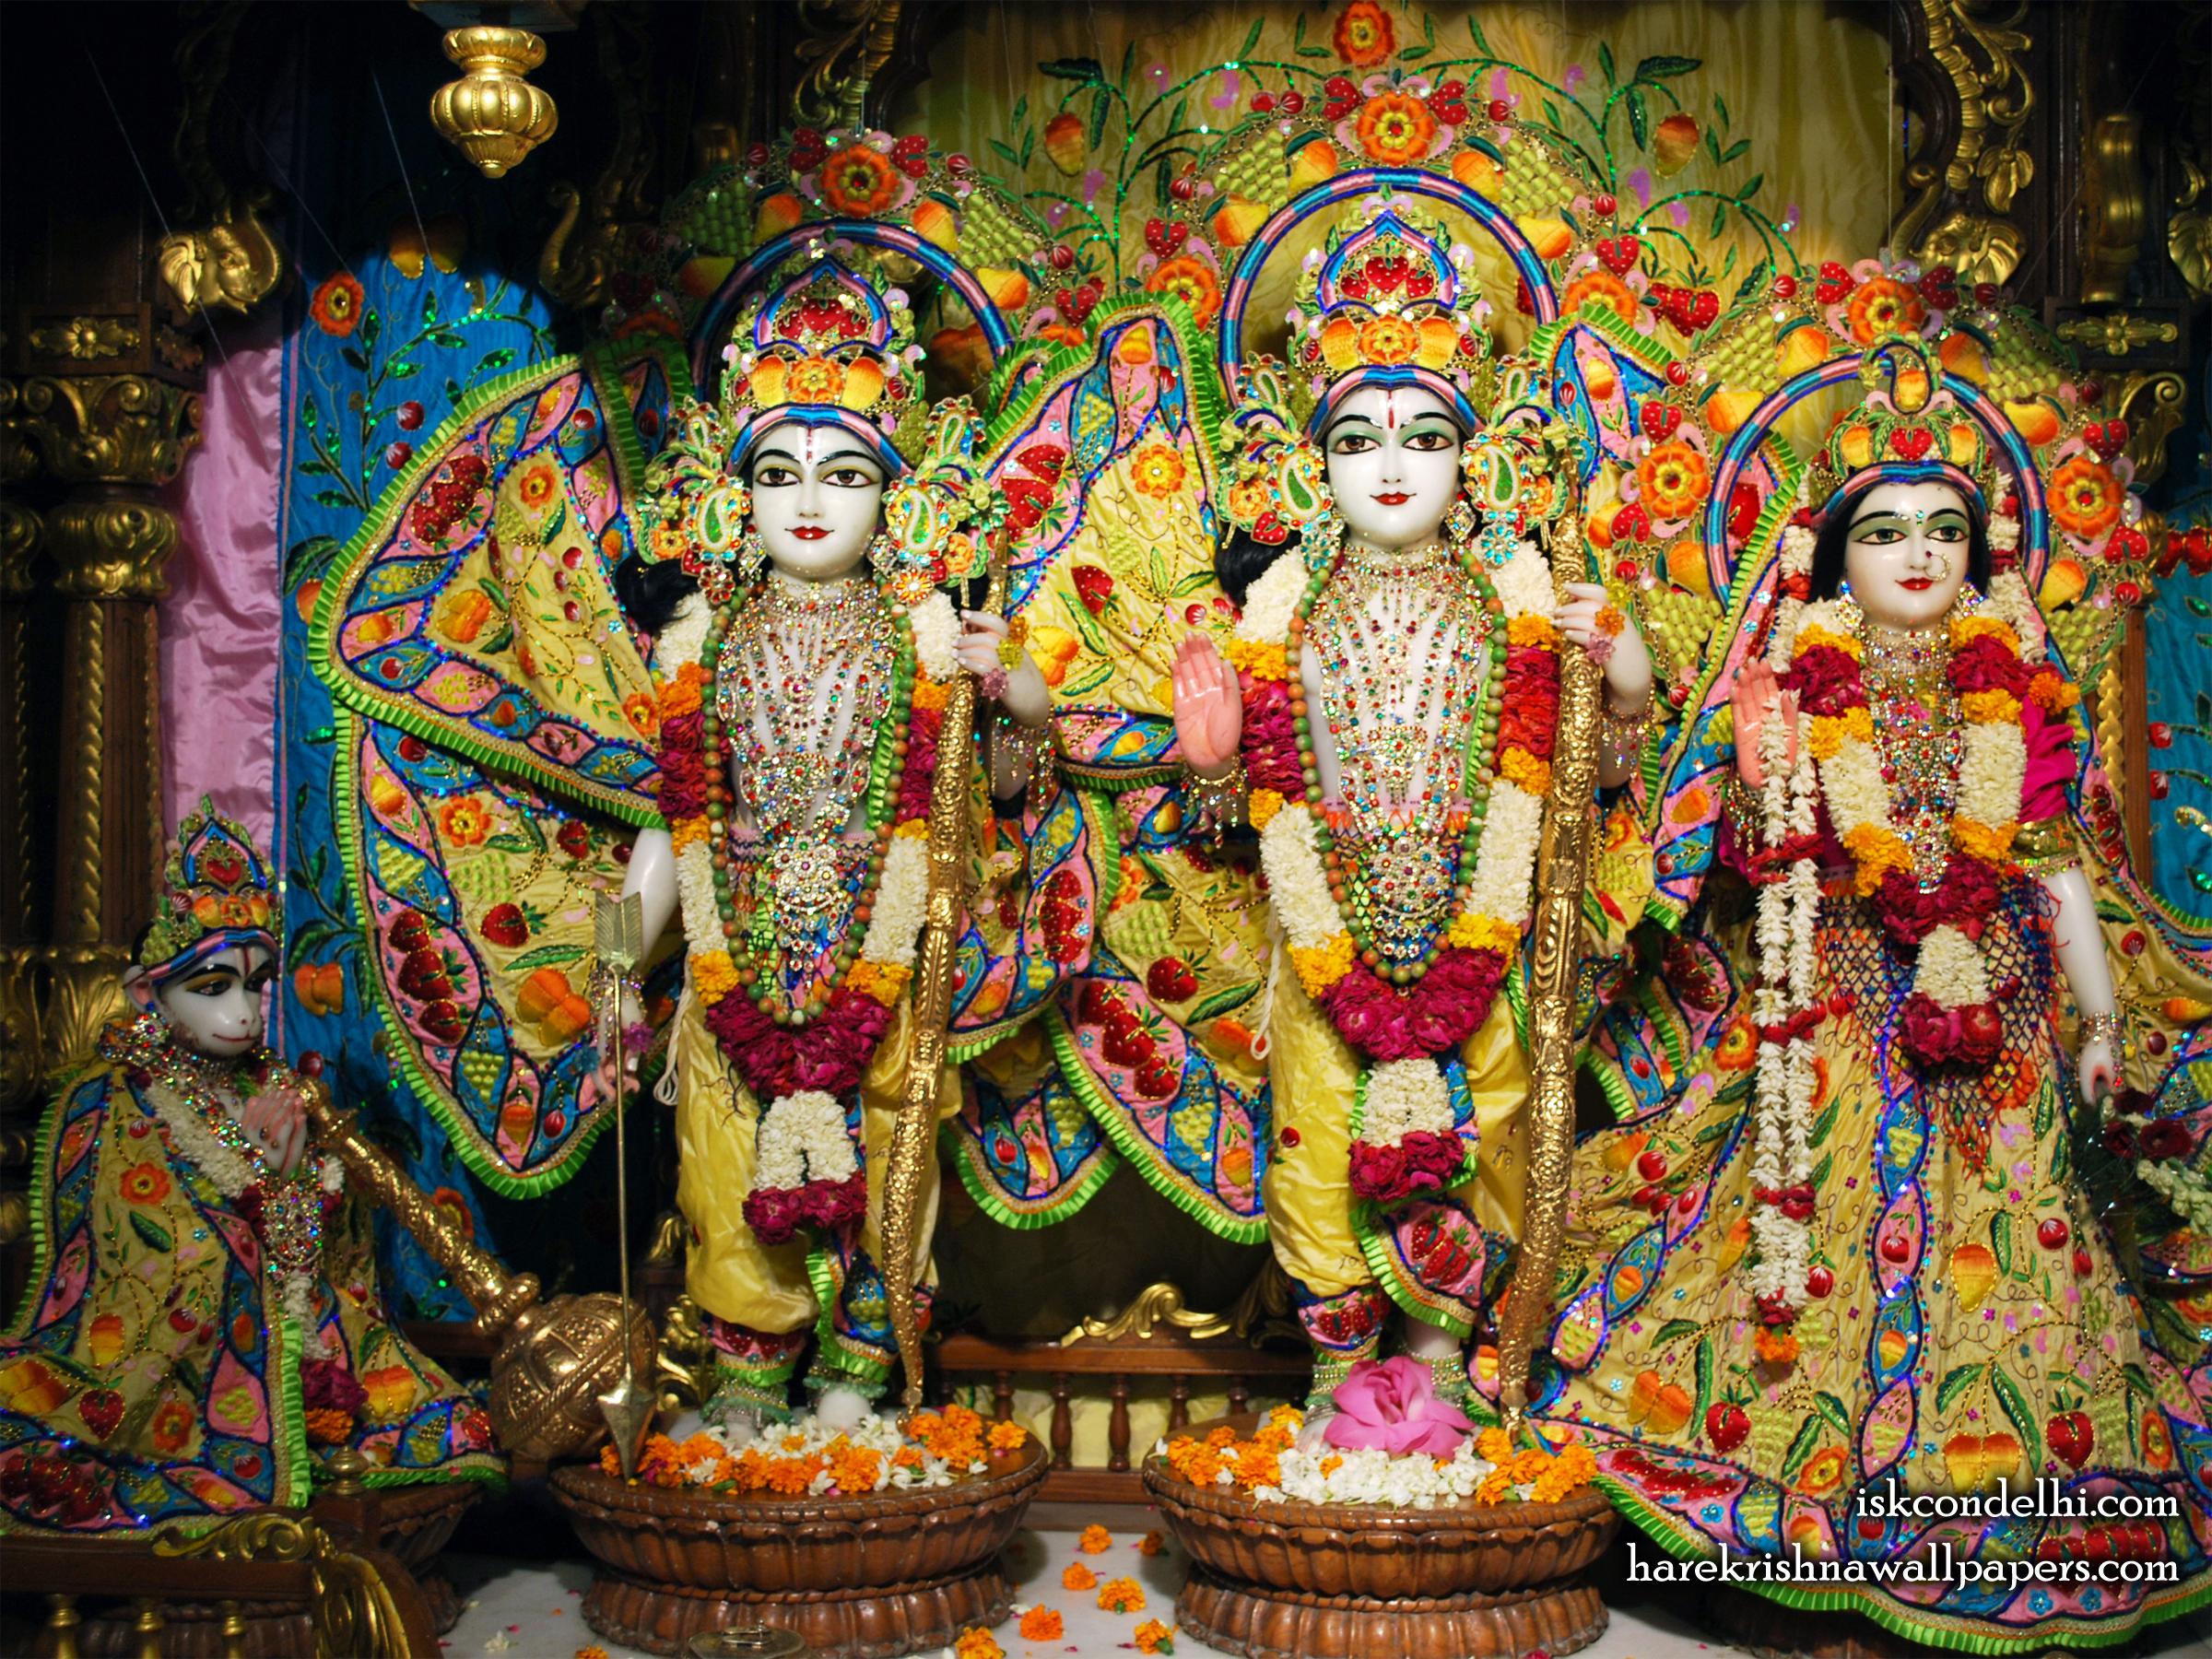 Sri Sri Sita Rama Laxman Hanuman Wallpaper (011) Size 2400x1800 Download